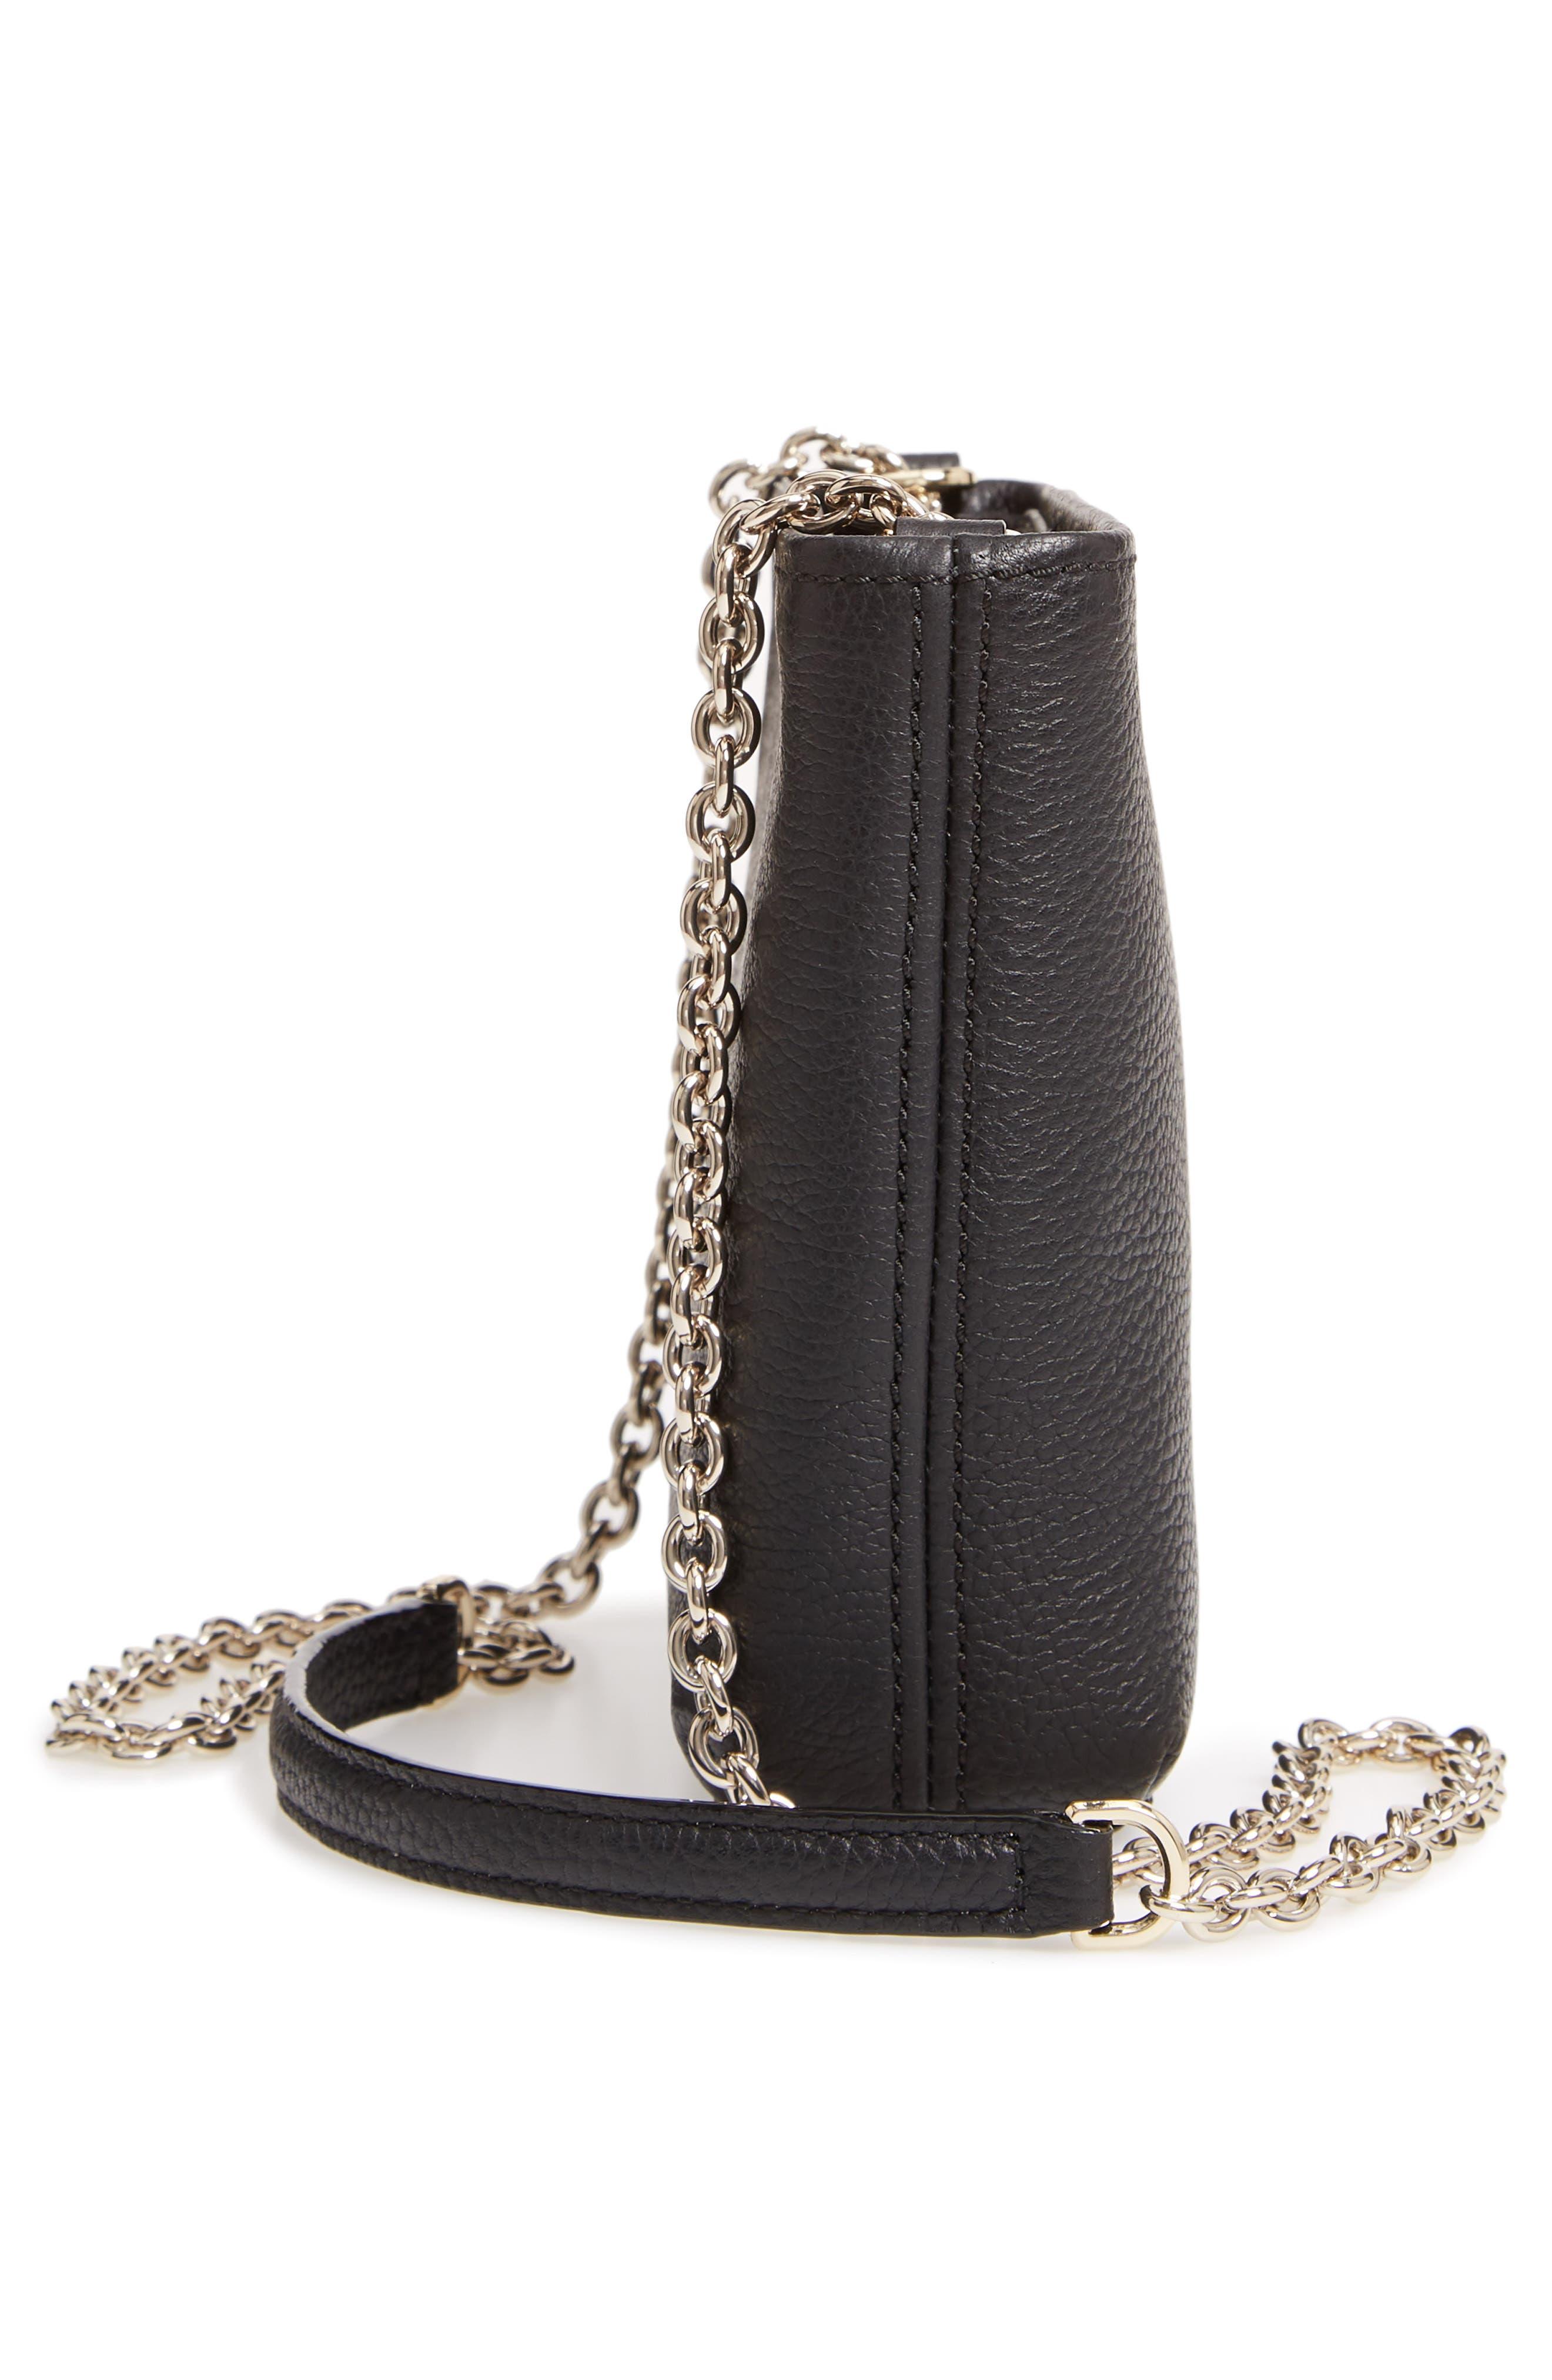 jackson street - ellery leather crossbody bag,                             Alternate thumbnail 5, color,                             BLACK